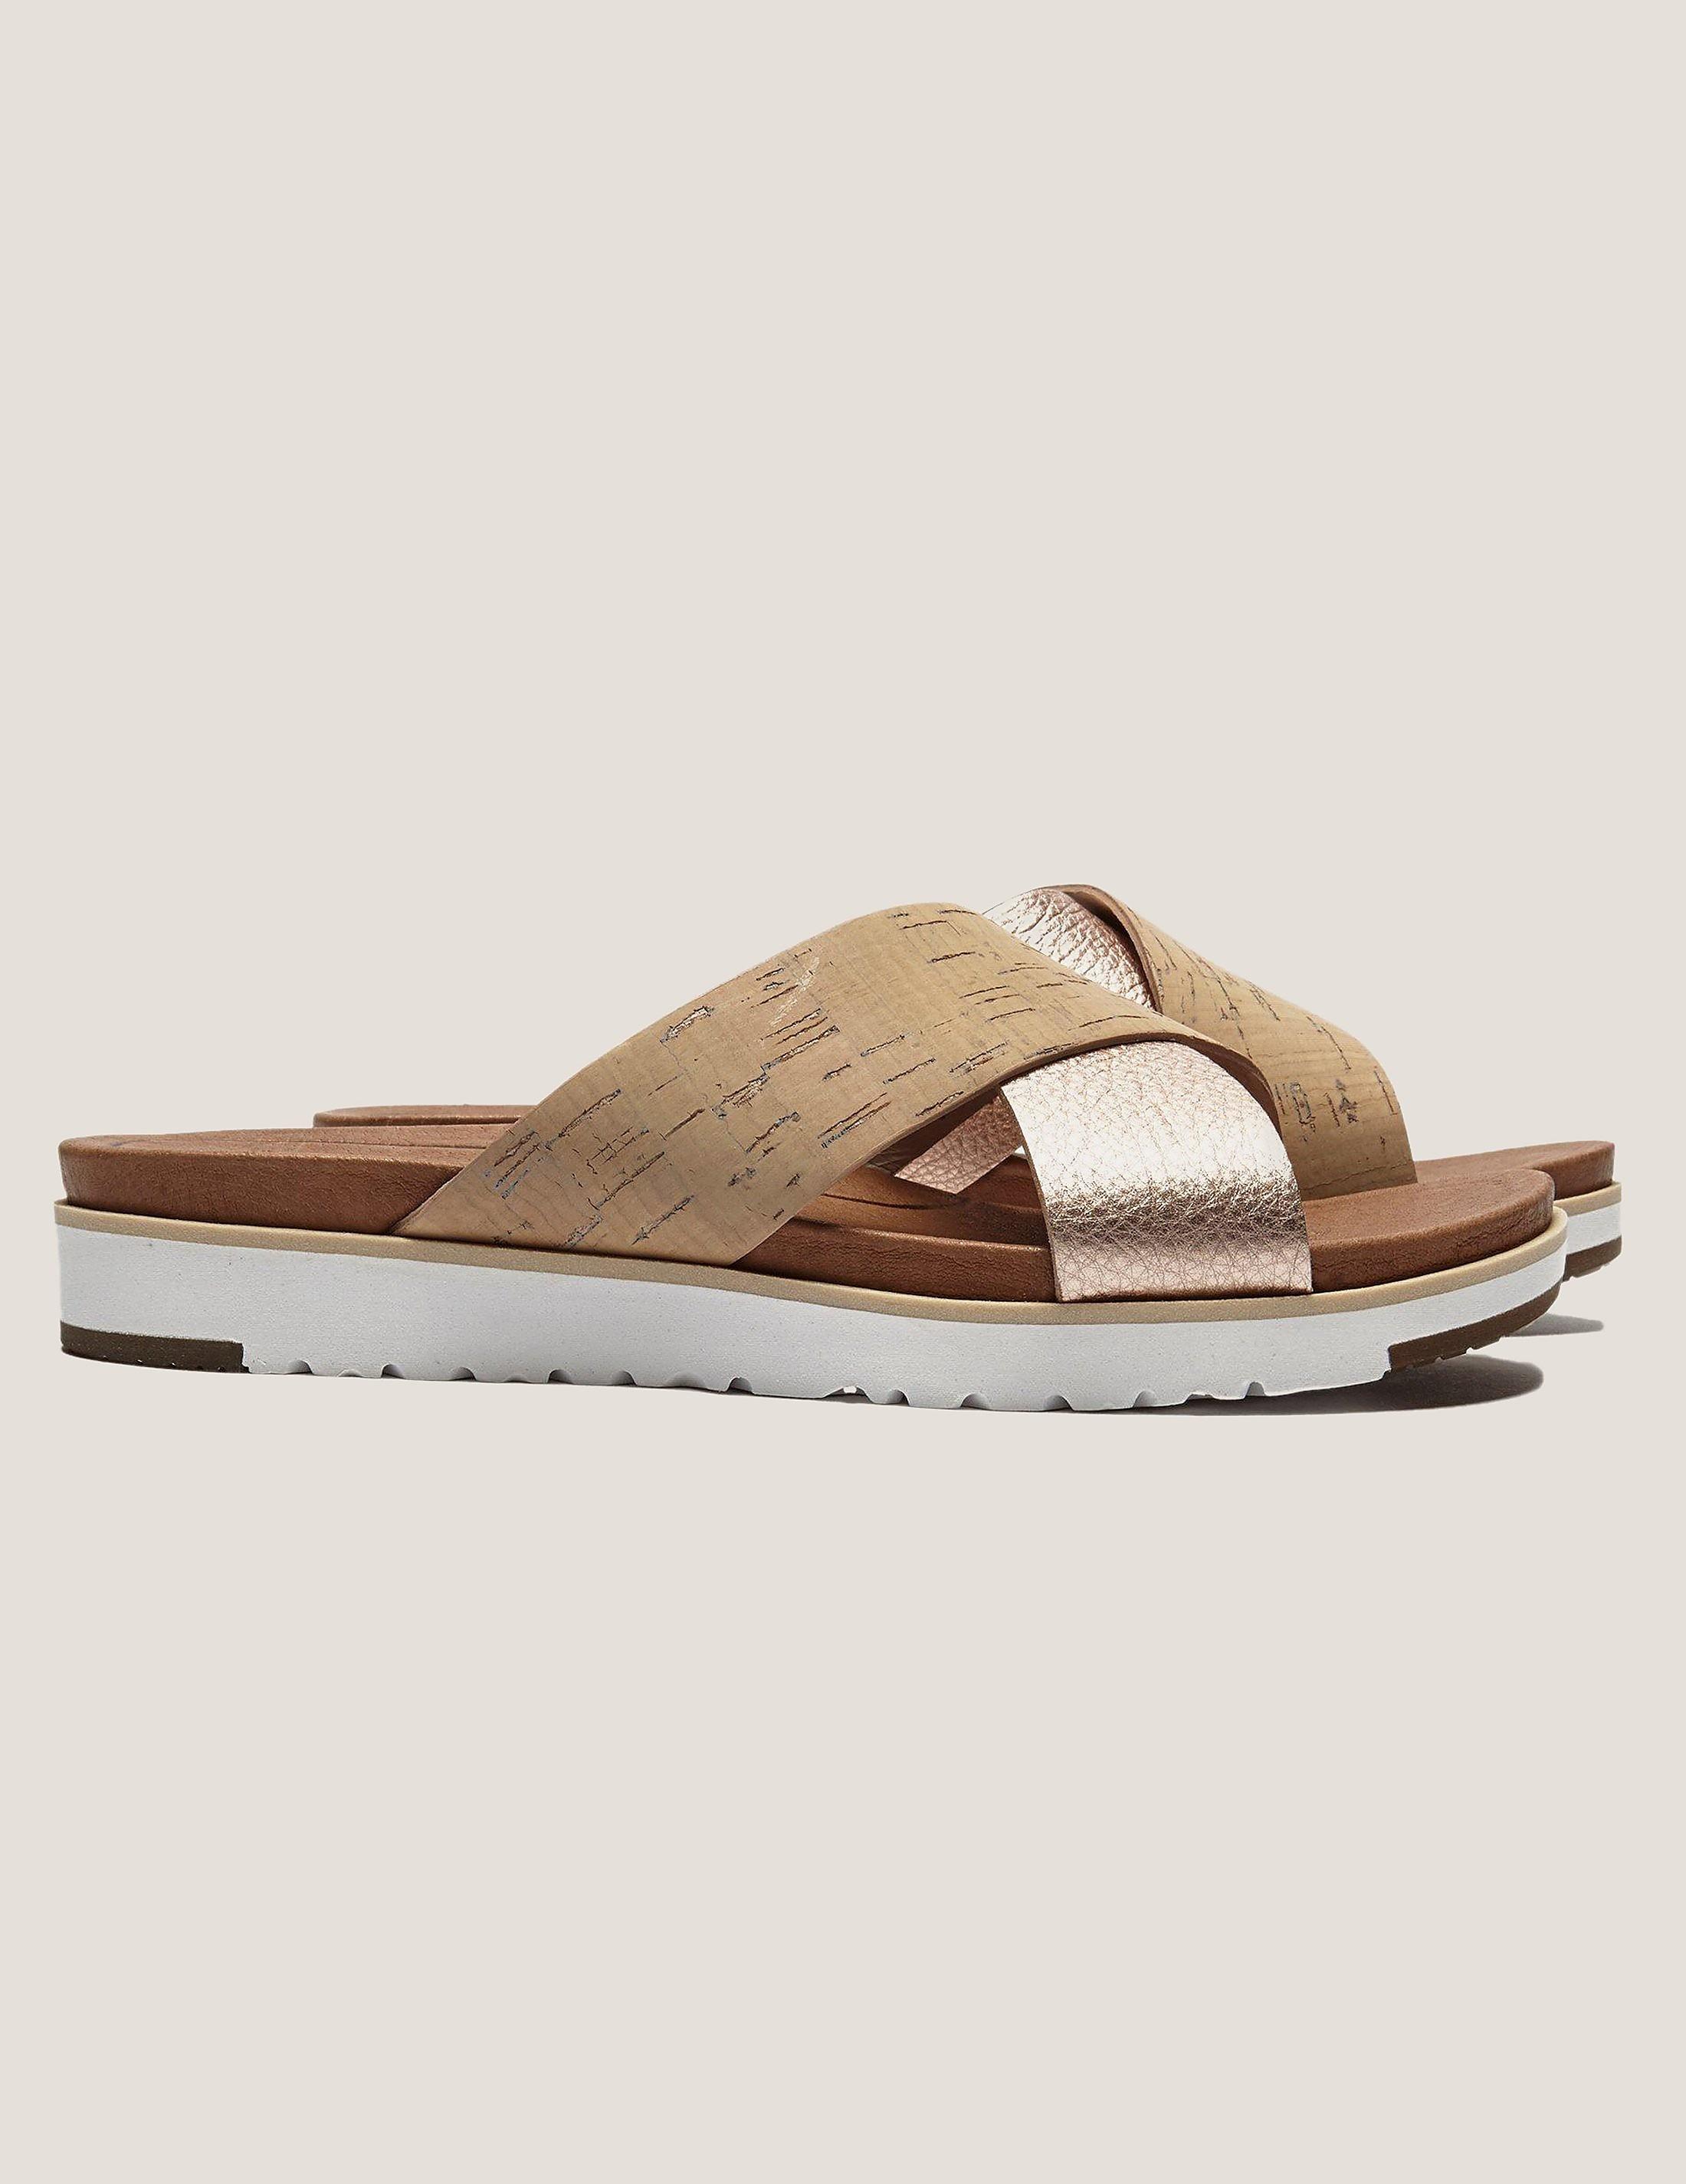 UGG Kari Sandals